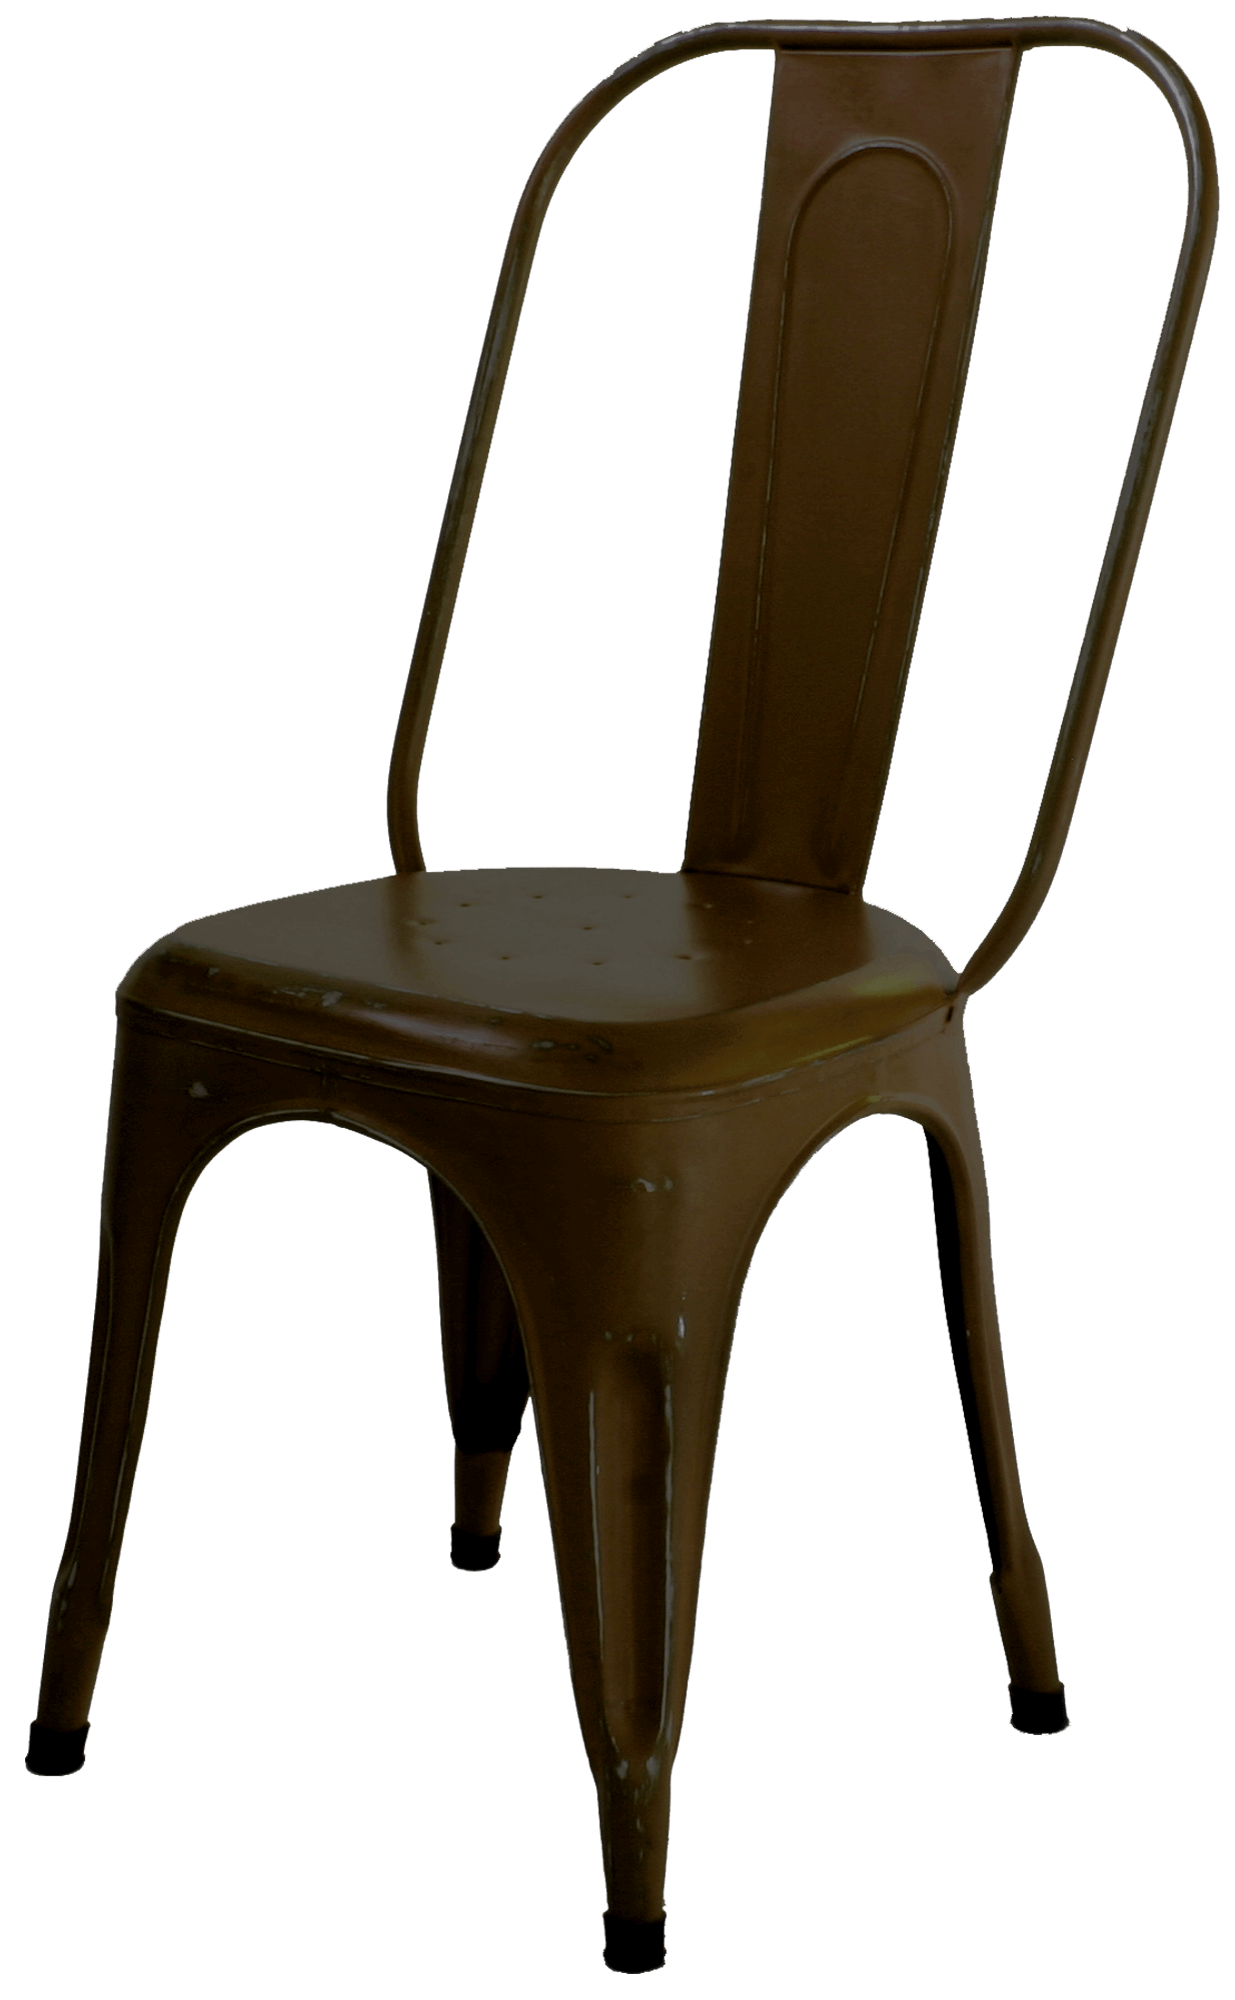 Industriële eetkamerstoel met vintage look naar Tolix